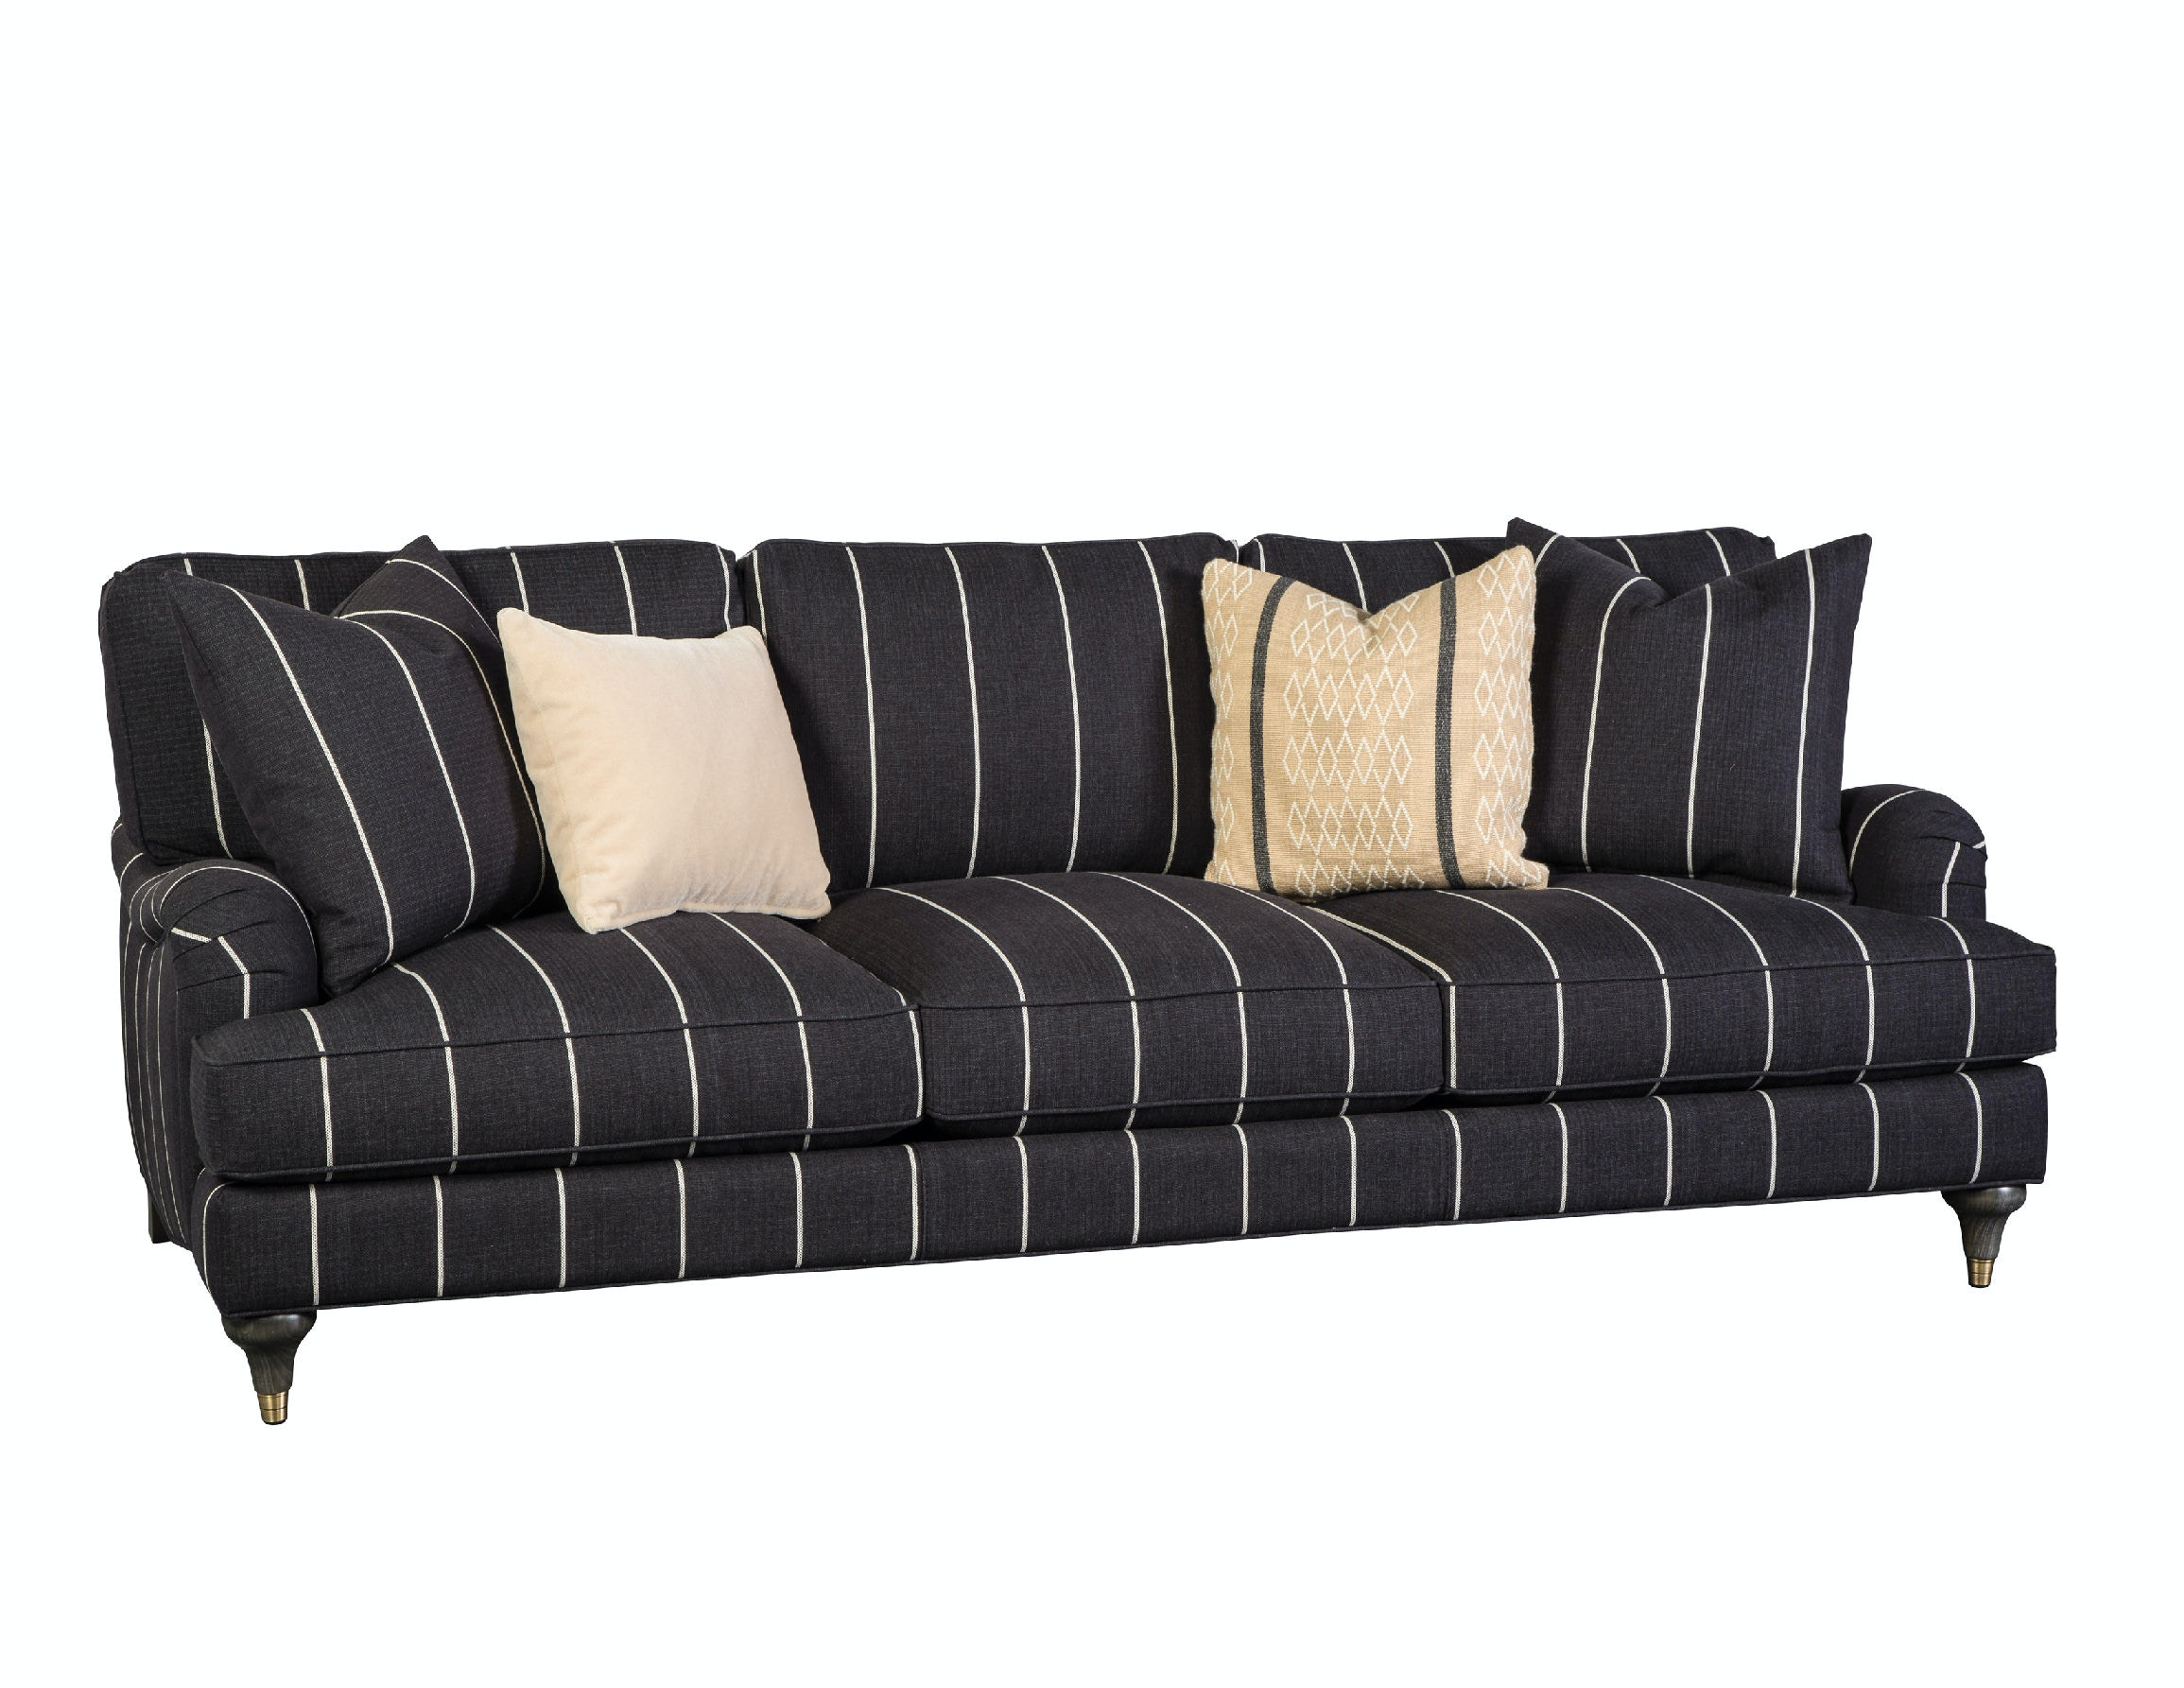 sectional sofa dallas fort worth buy sleeper jonathan louis international living room 30830